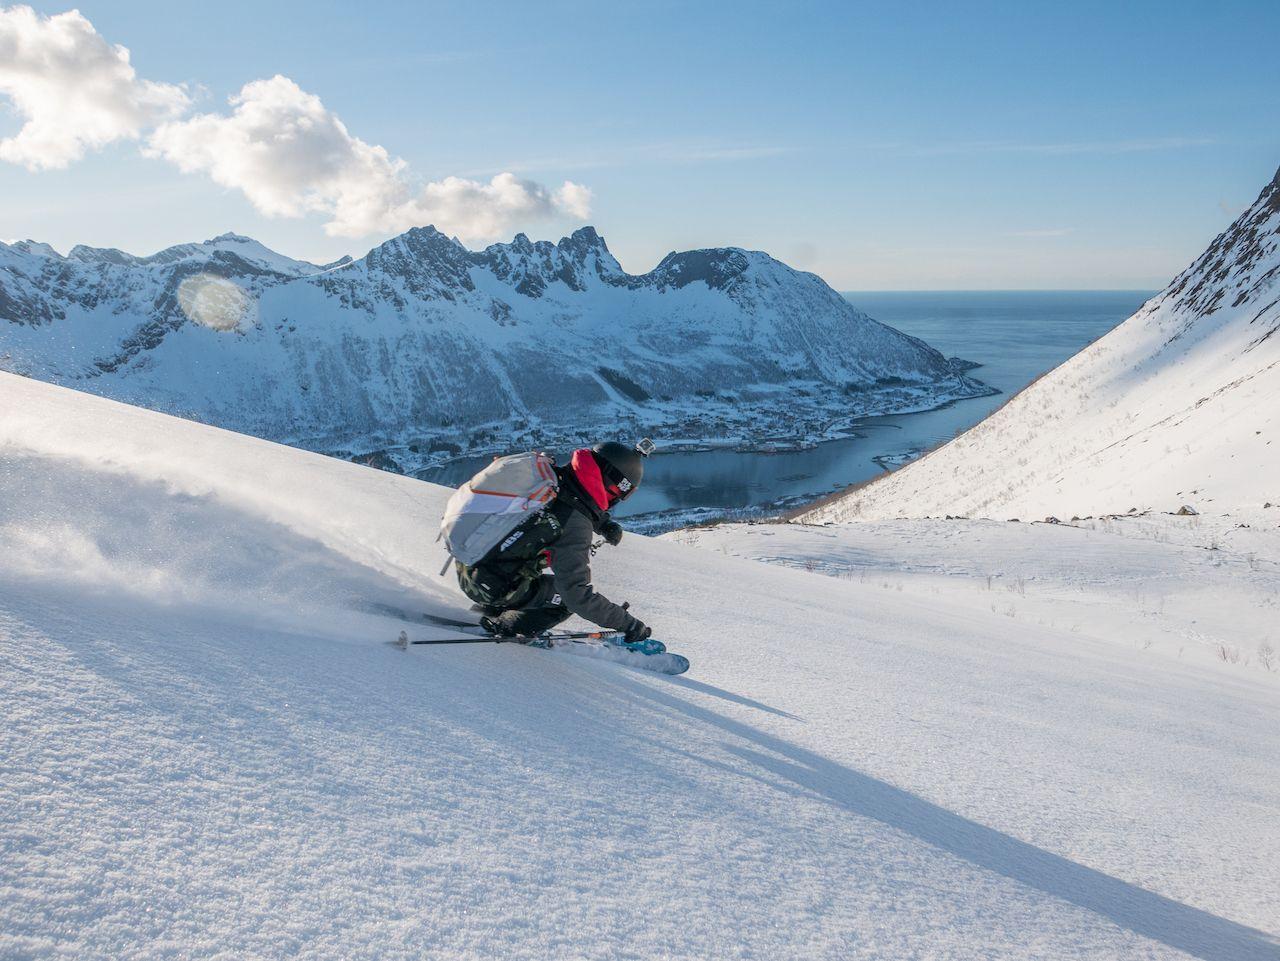 Ski touring on Senja Island